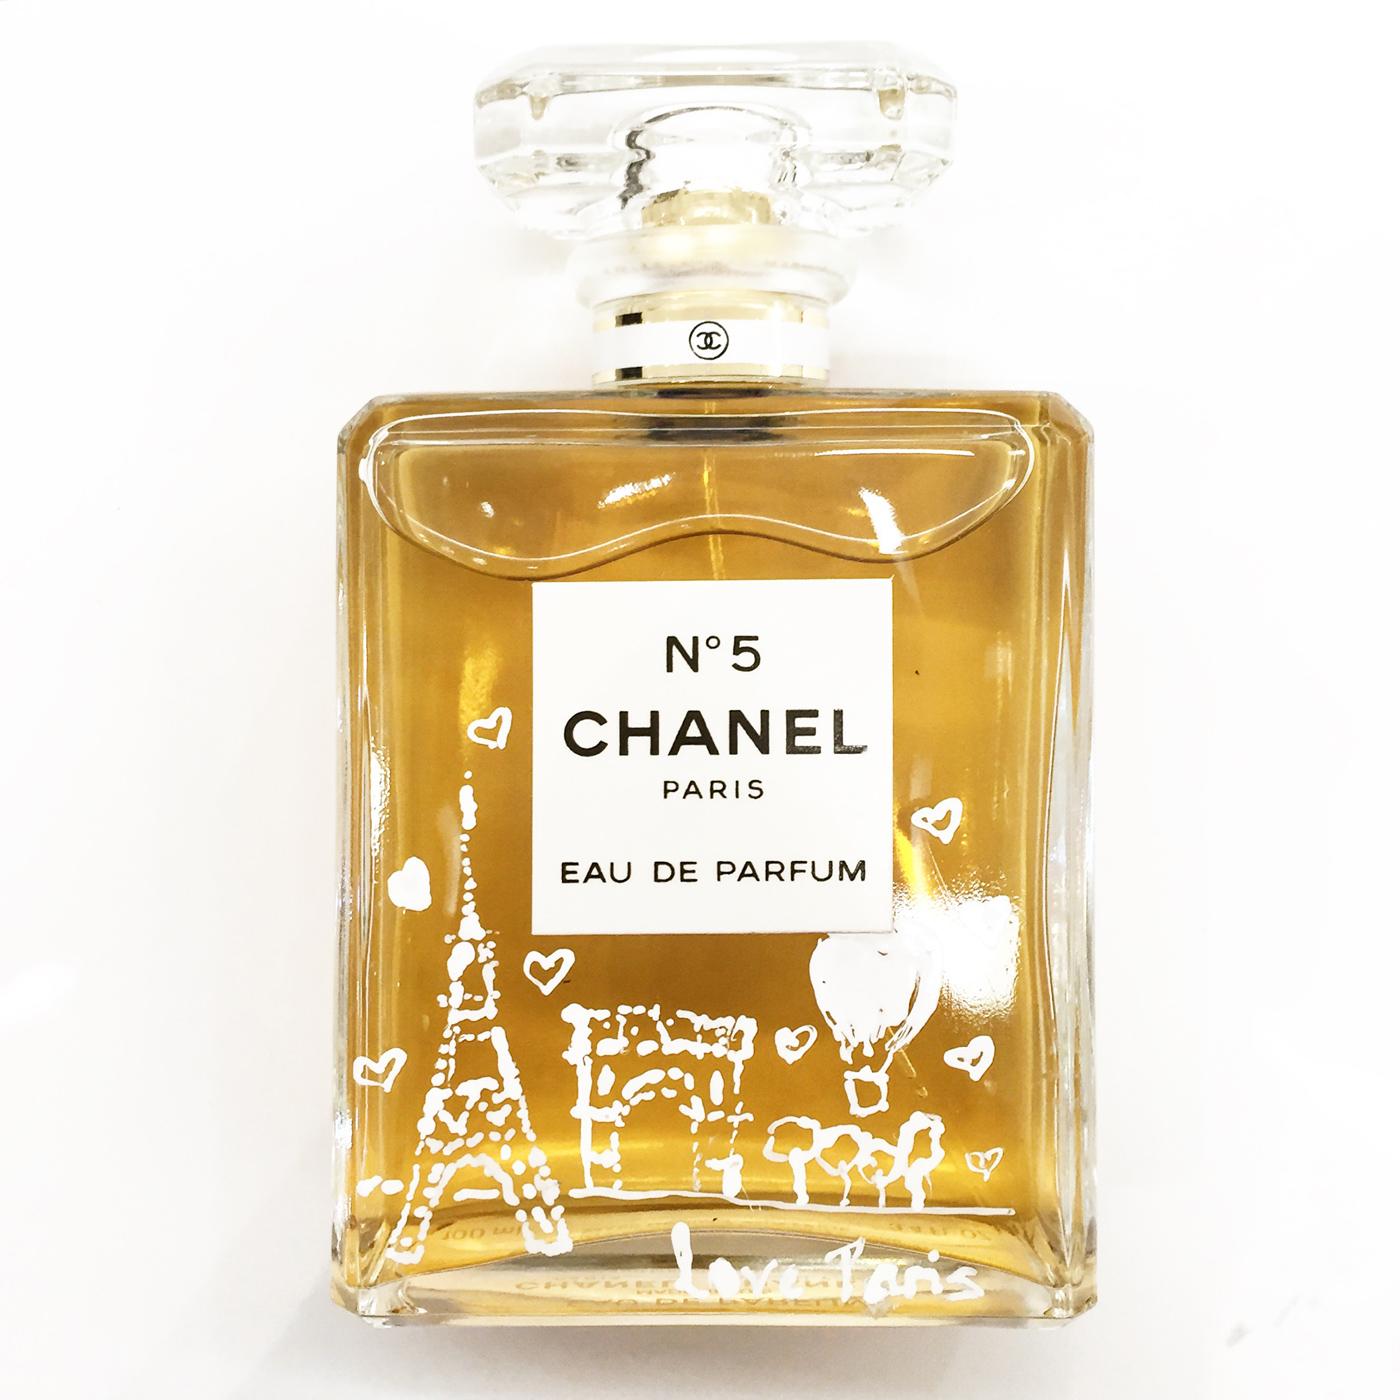 TAOS-Chanel-no5-illustration